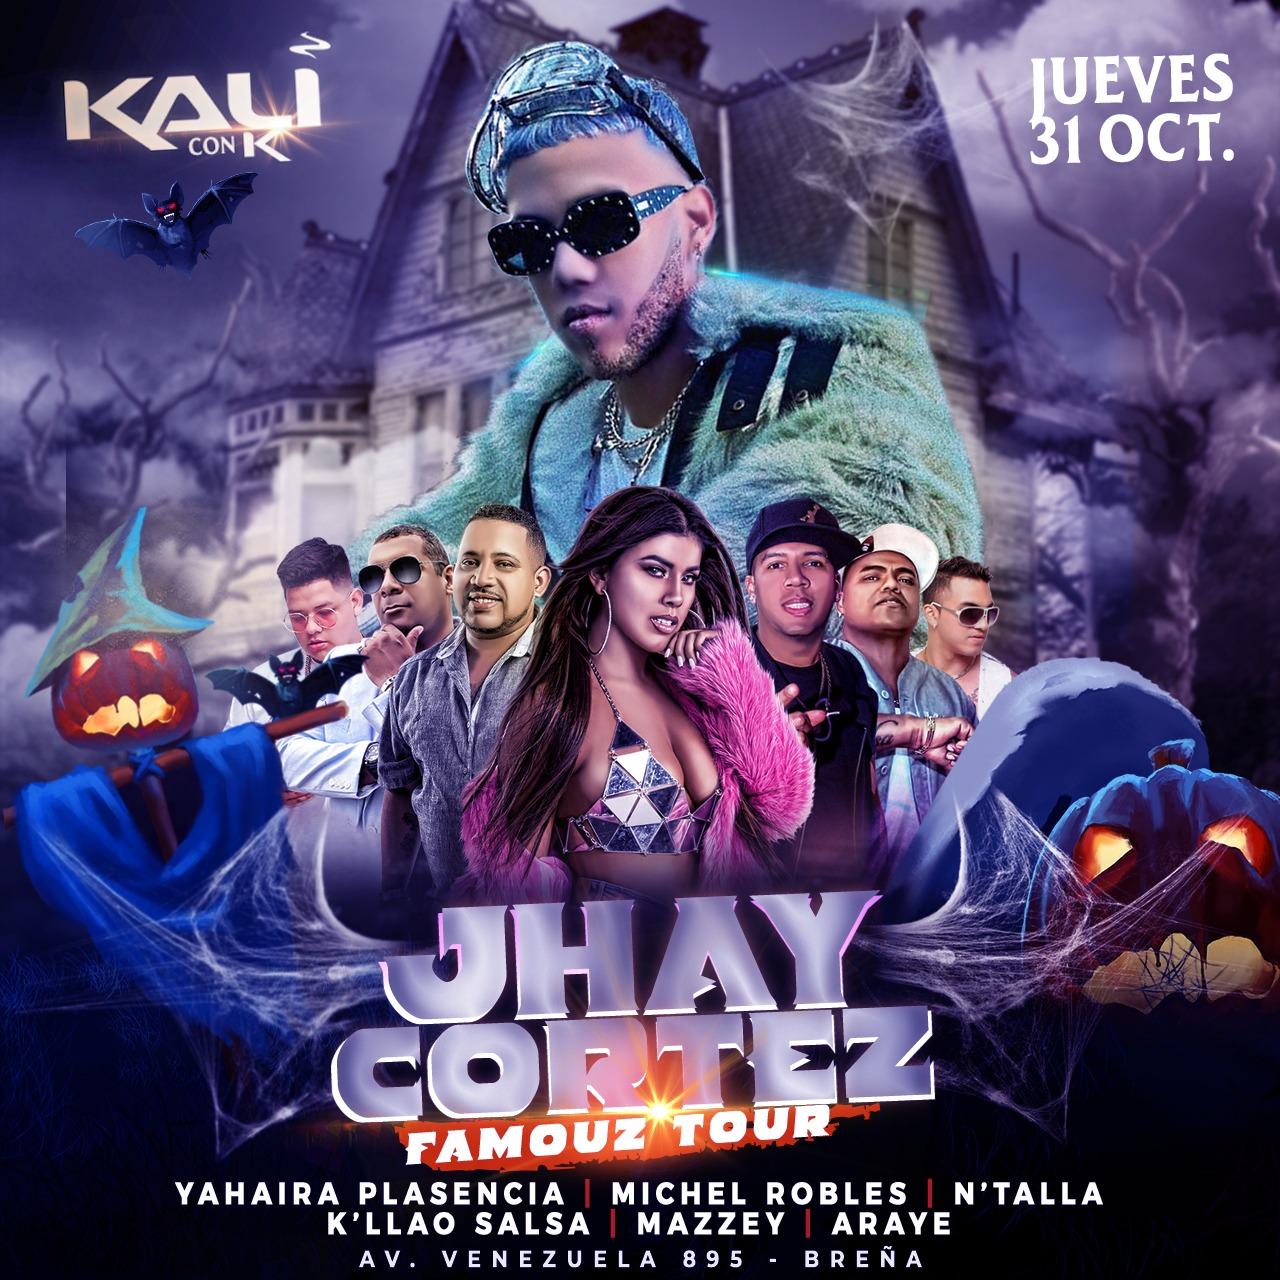 Jhay Cortez Kali Disco.jpeg - Jhay Cortez Llegara a Perú para el Famouz Tour